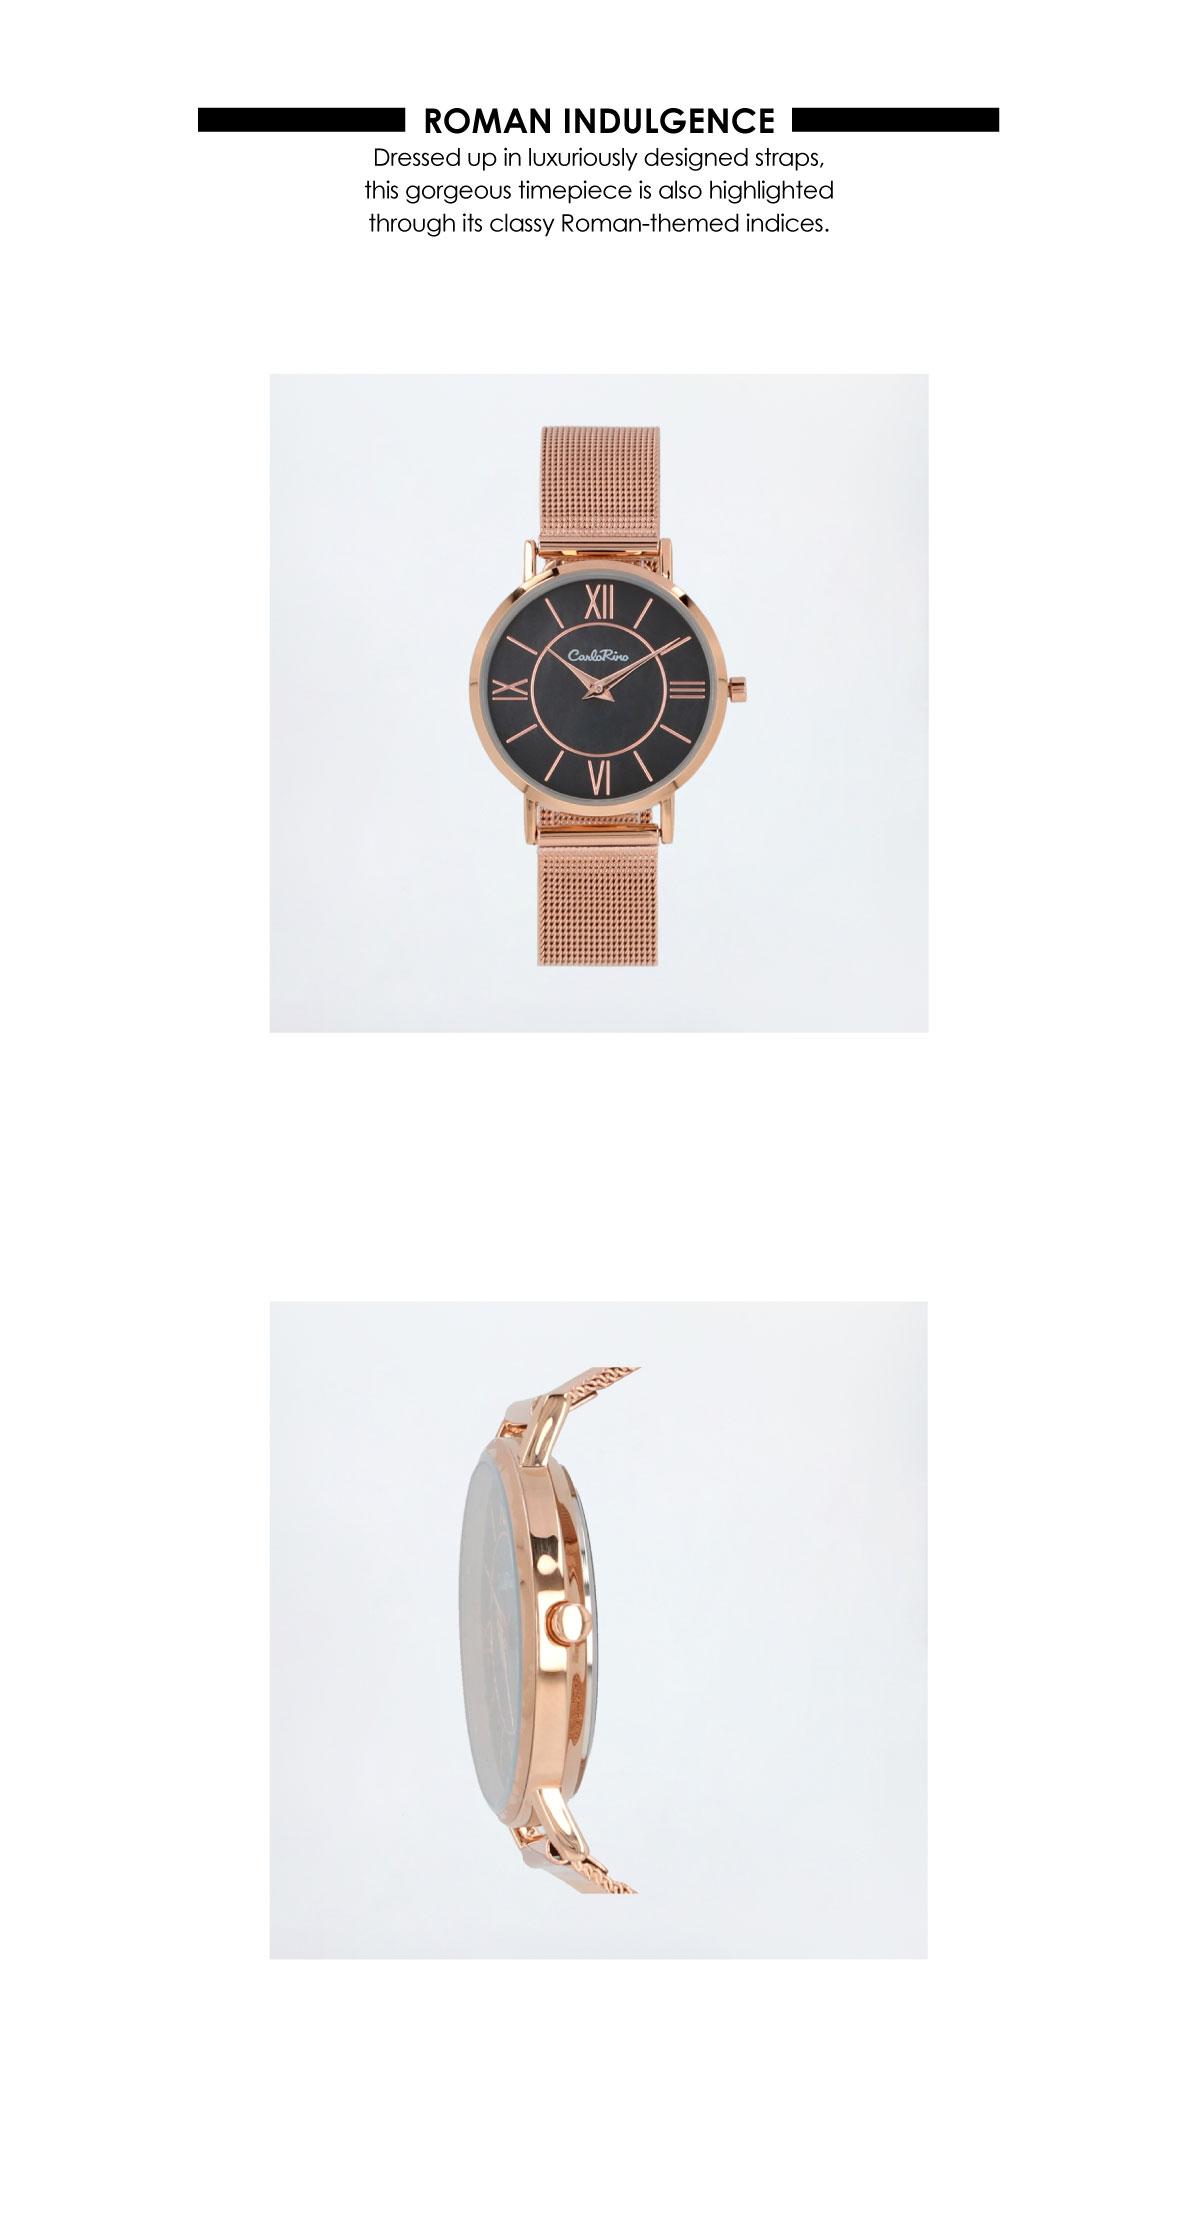 A93301 G007 32 02 - Roman Indulgence Mesh Band Timepiece